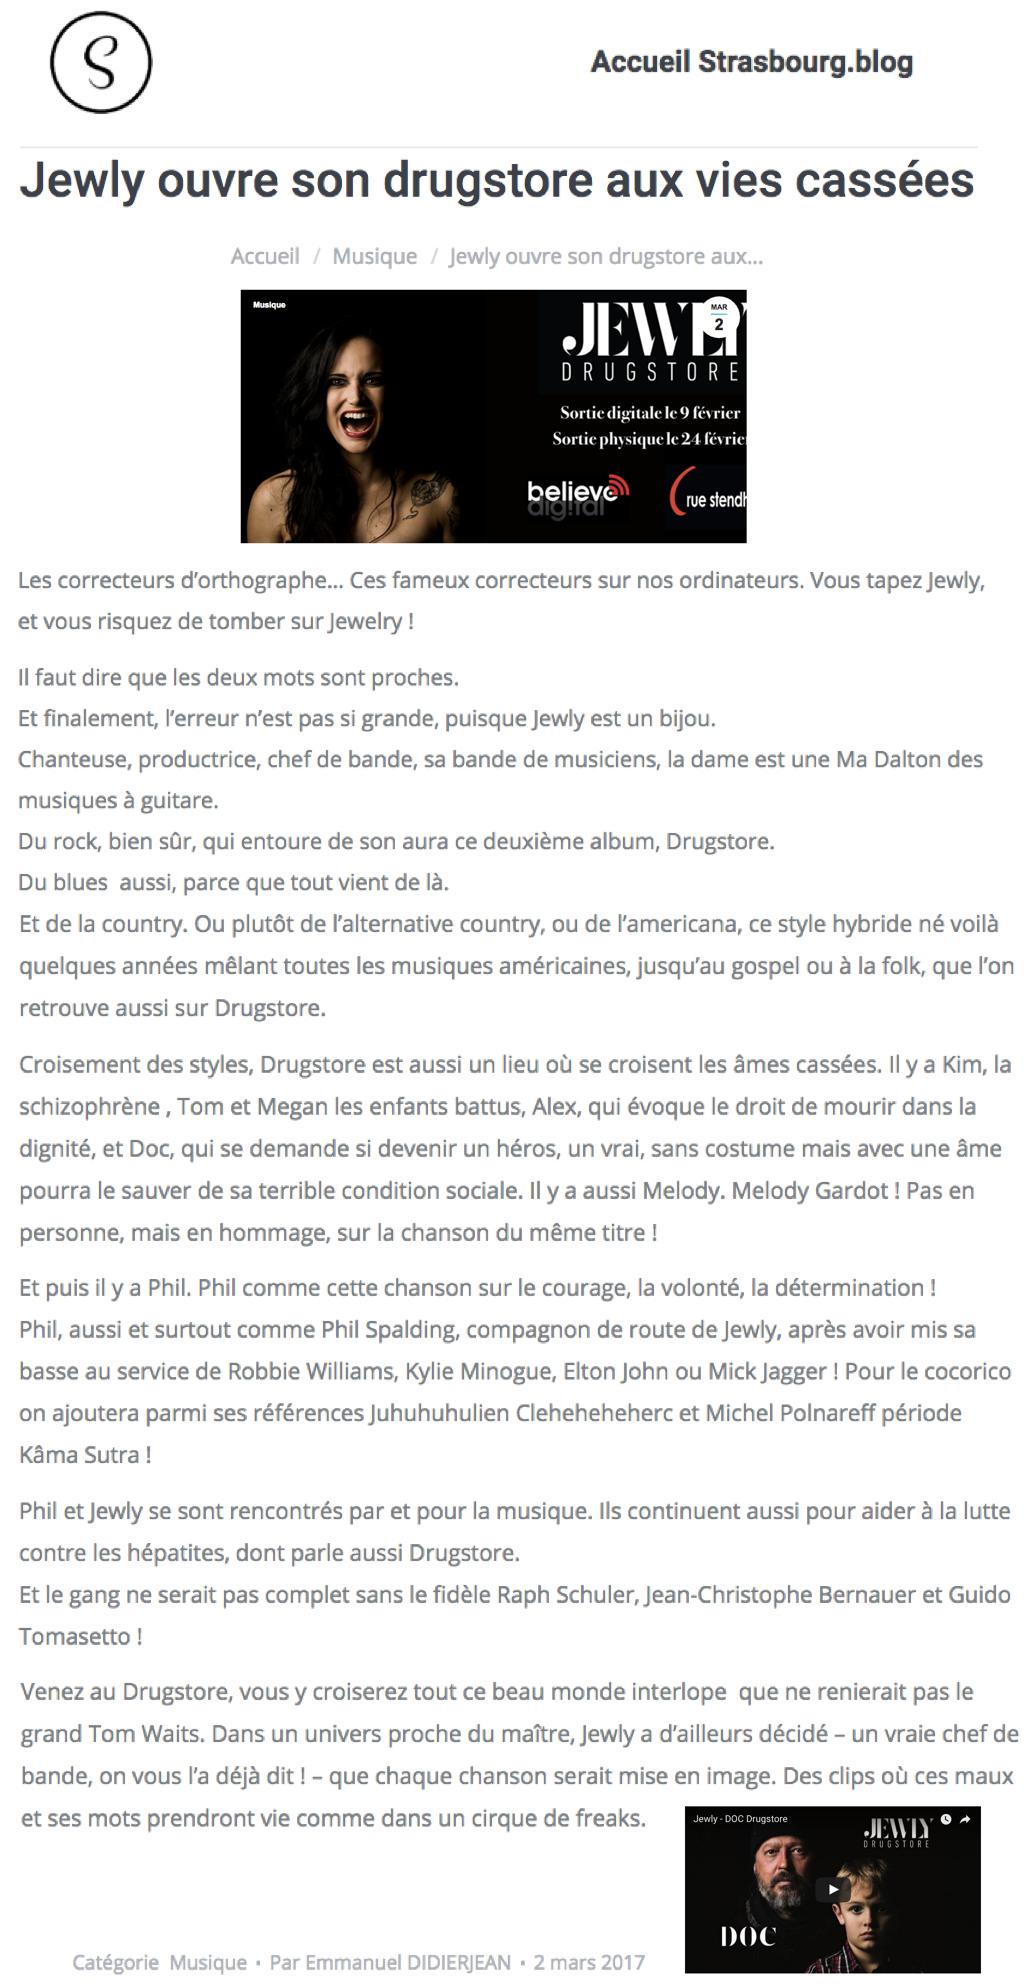 Strasbourg Blog - 02/03/2017